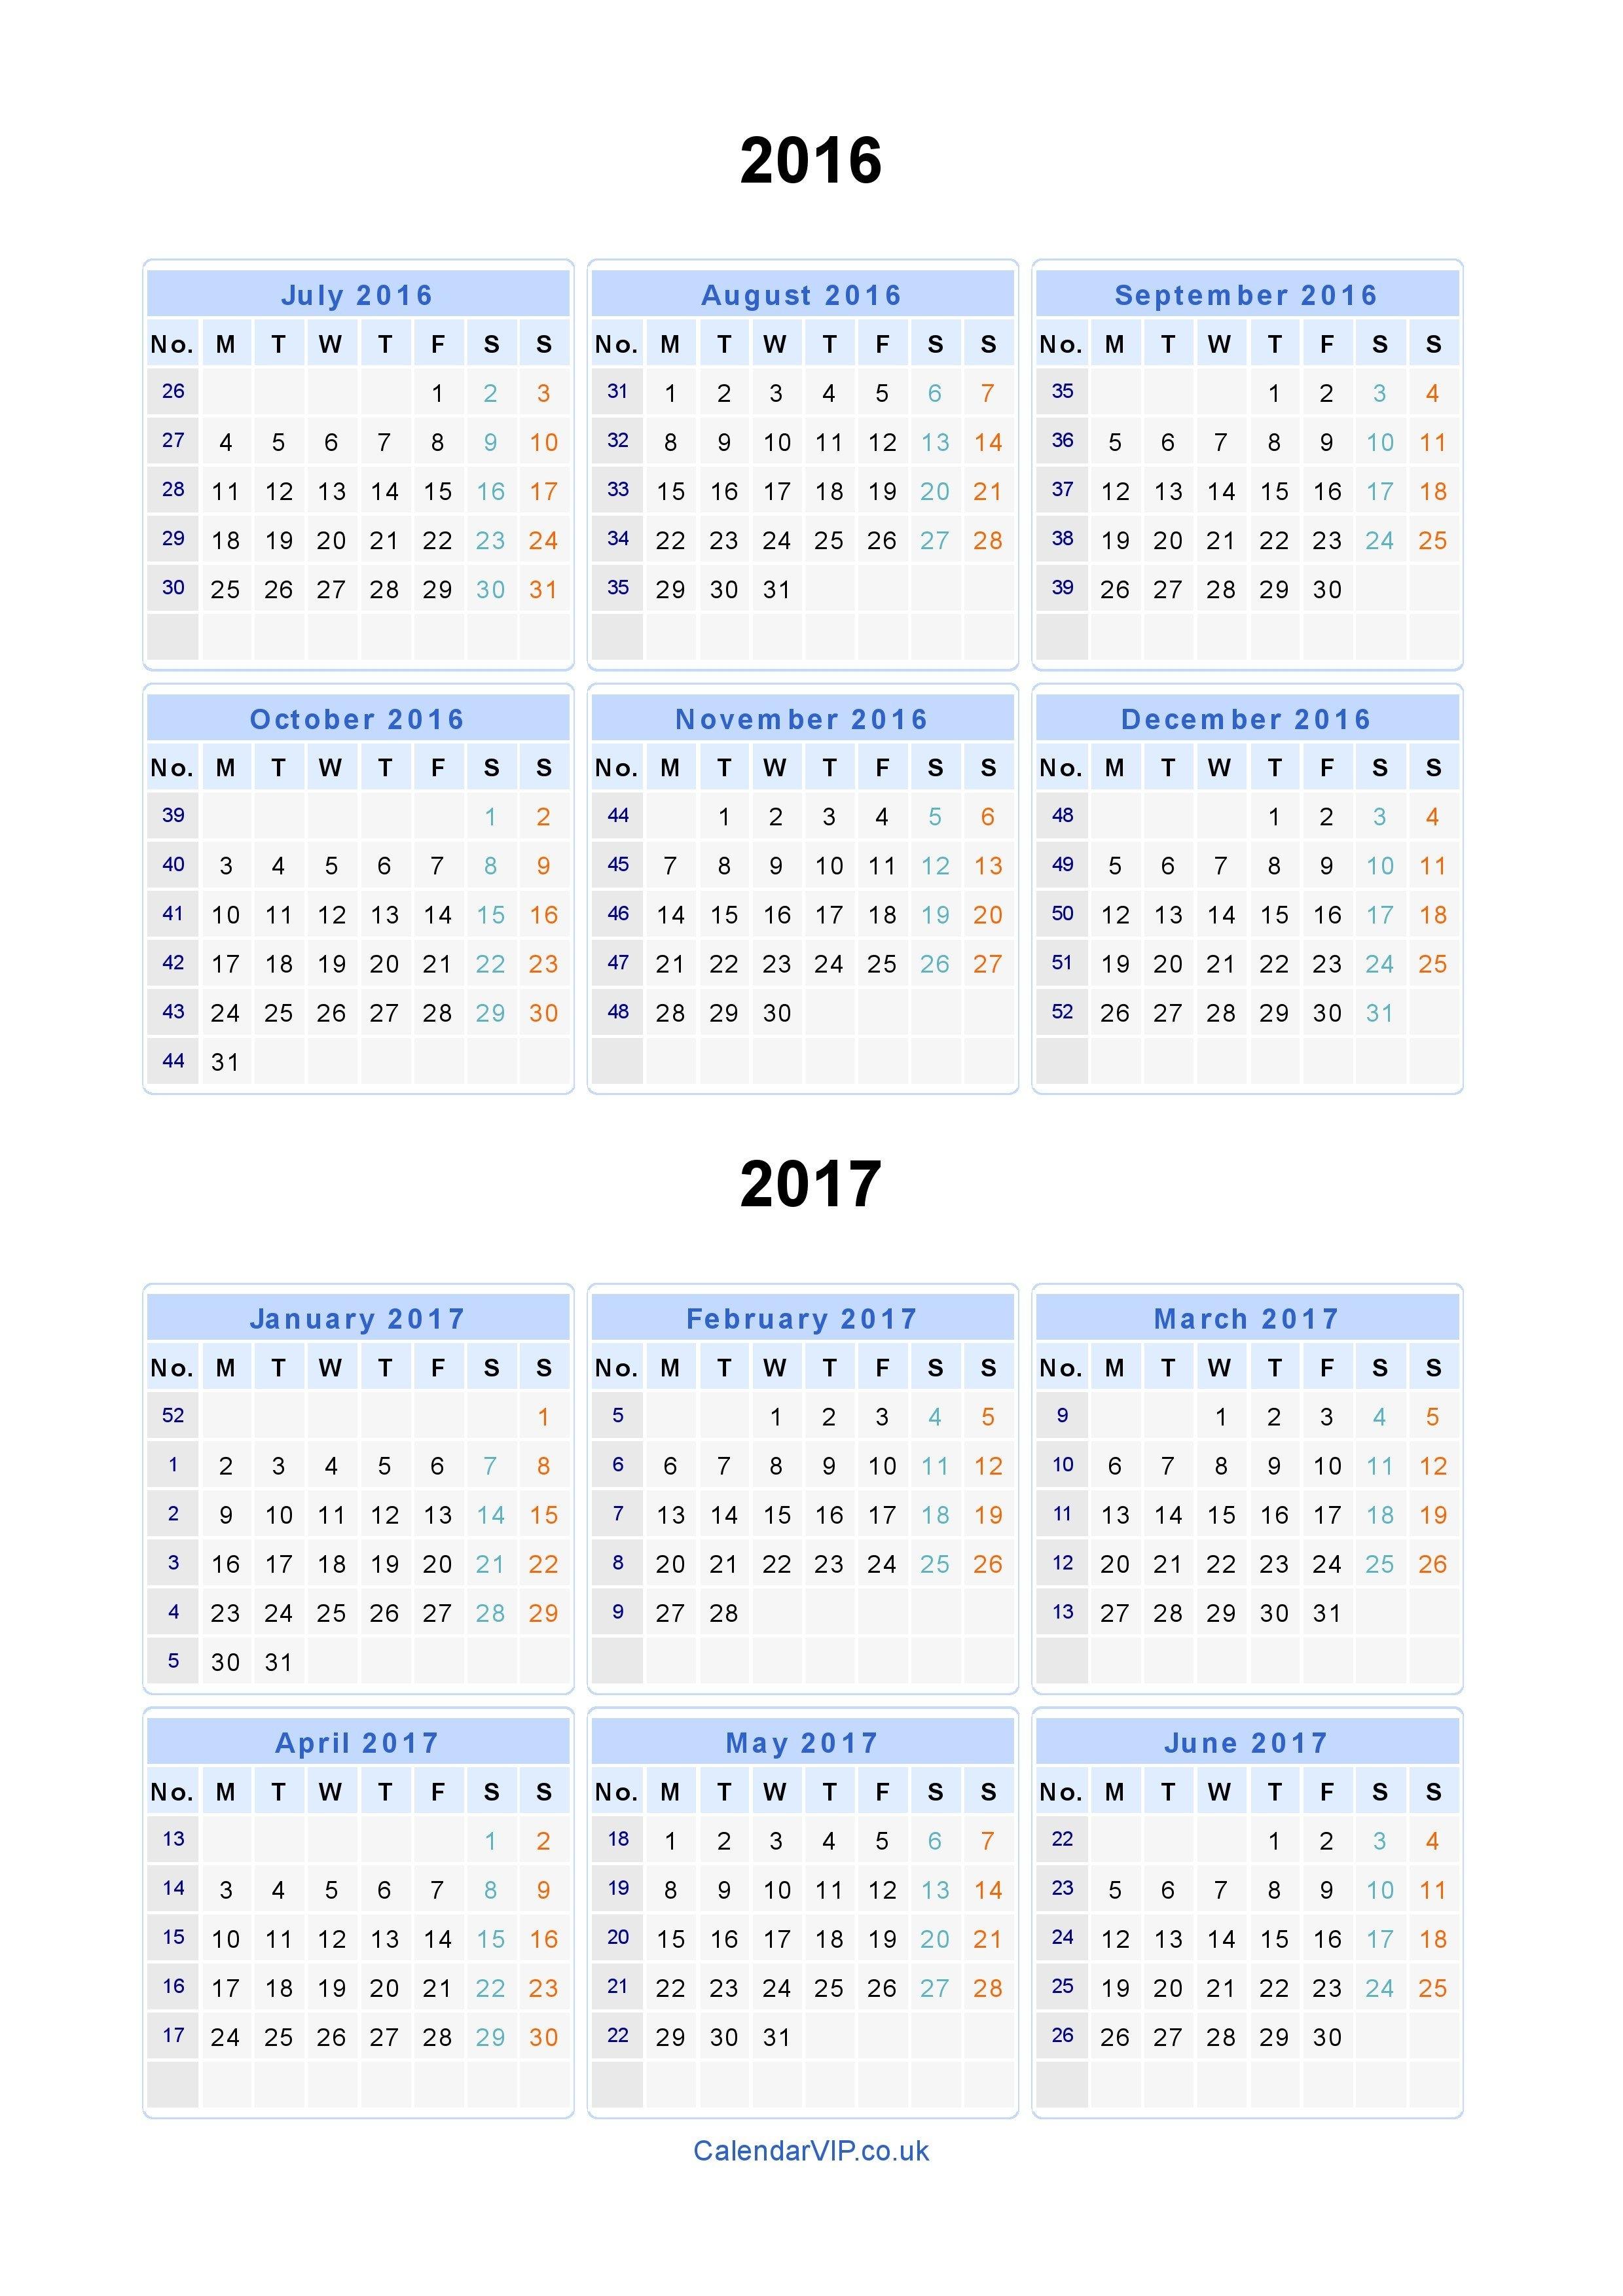 Split Year Calendars 2016 2017 - Calendar From July 2016 To June 2017 July 9 2019 Calendar